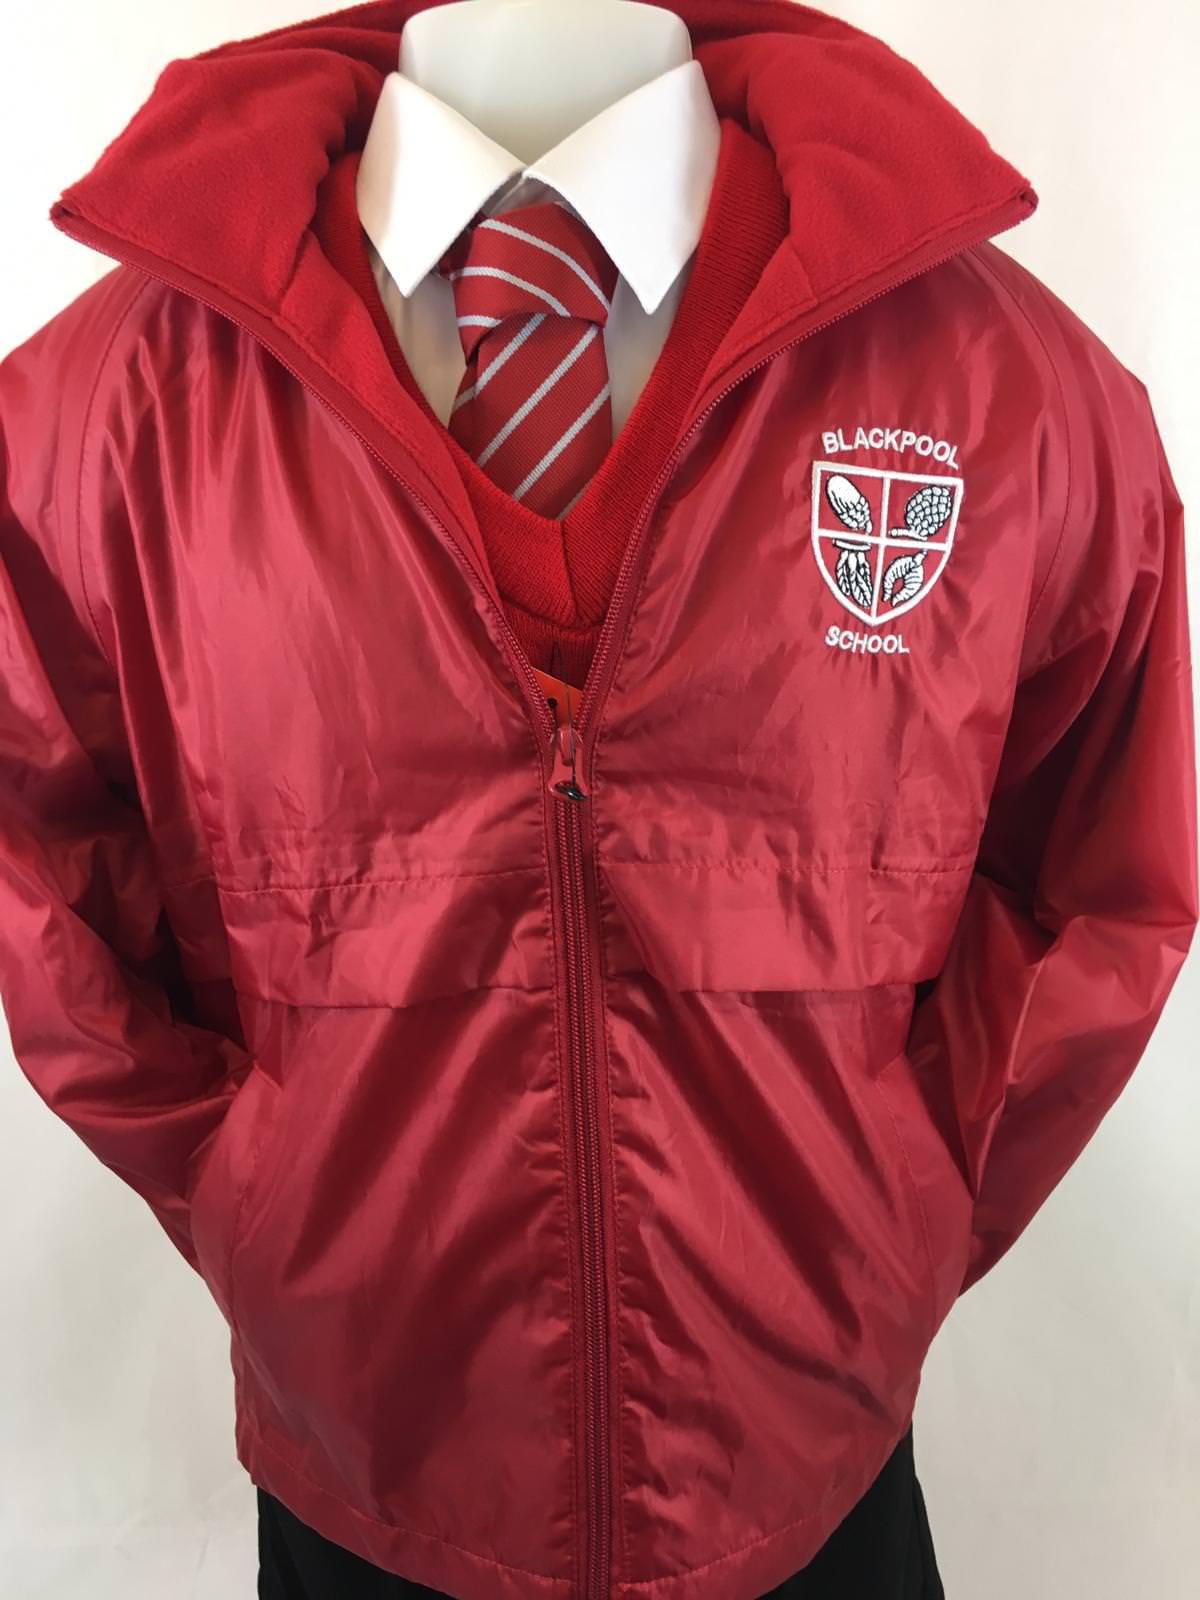 dcb2b2b9d Blackpool Primary School Lightweight Jacket